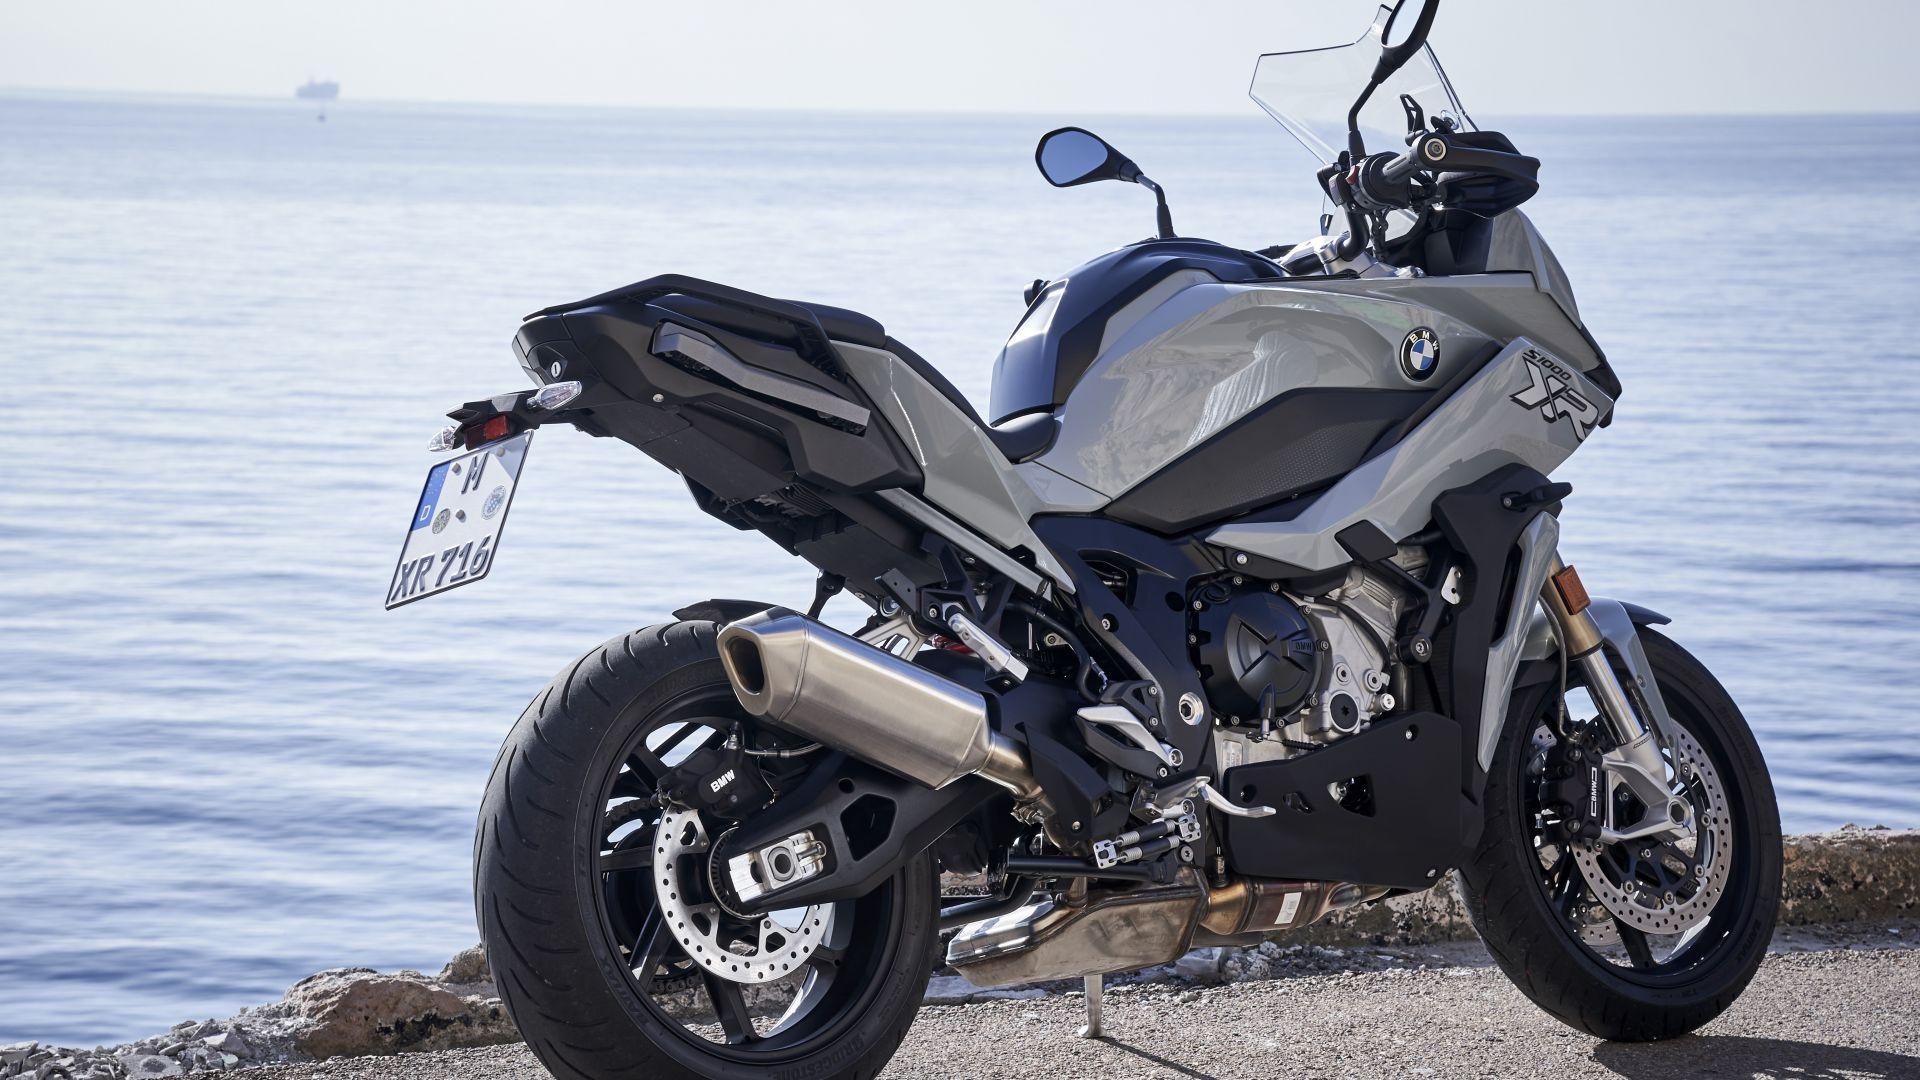 BMW S 1000 XR 2020: prova, pregi, difetti, prezzo - MotorBox